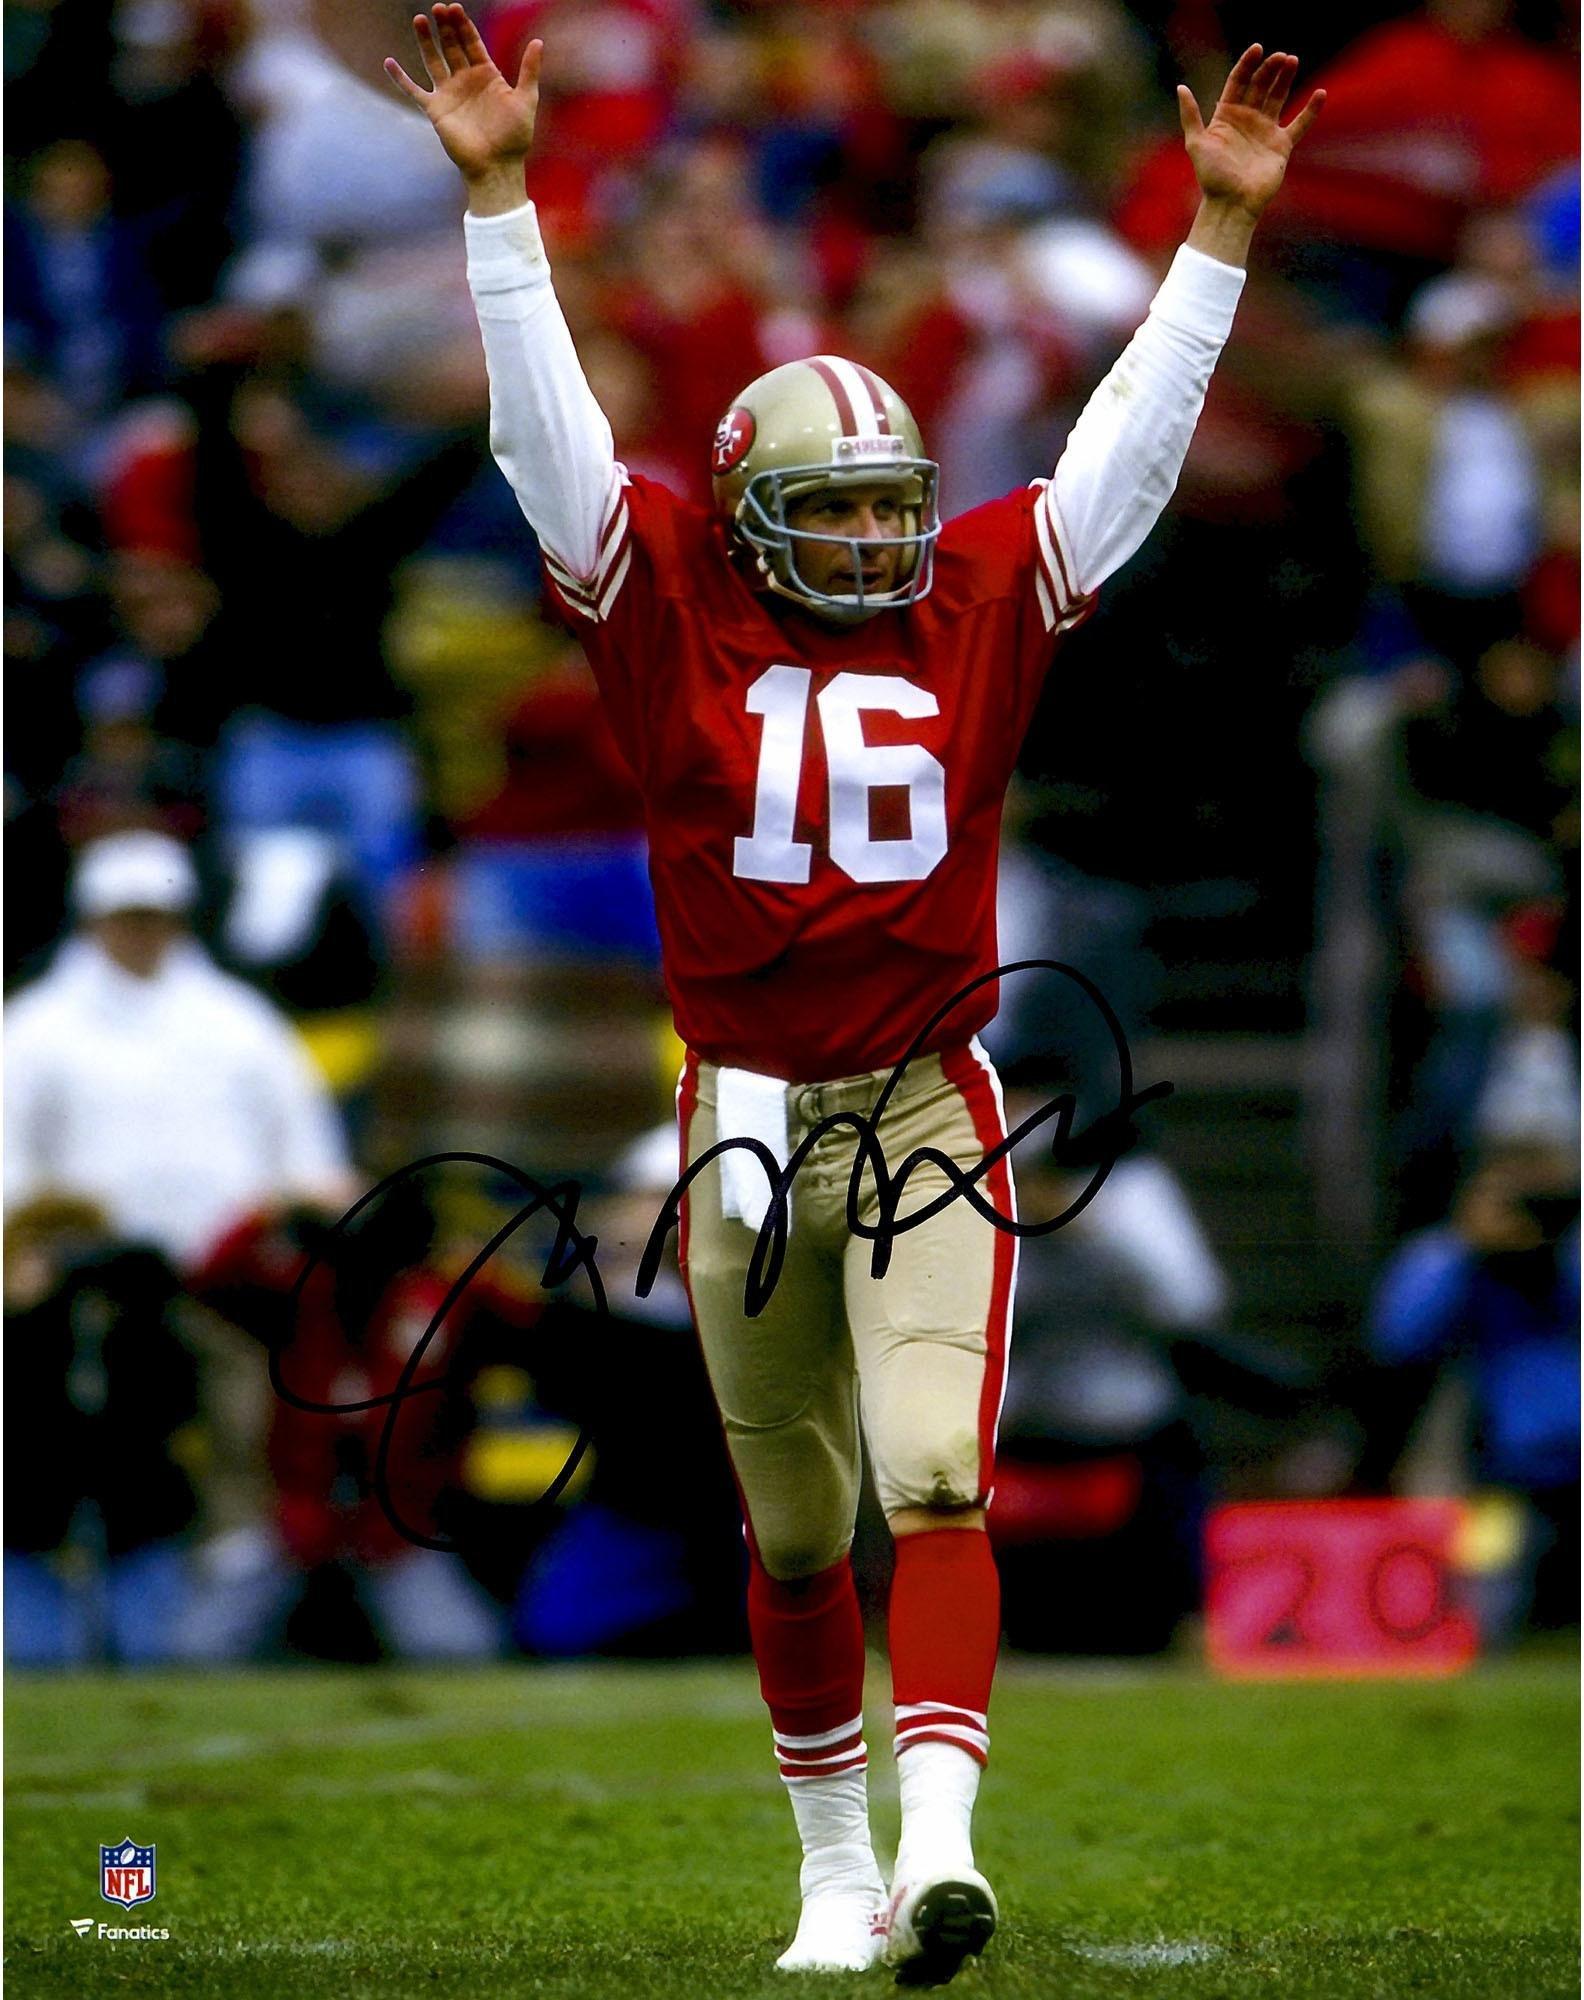 "Joe Montana San Francisco 49ers Autographed 8"" x 10"" Hands Up Photograph Fanatics Authentic Certified"